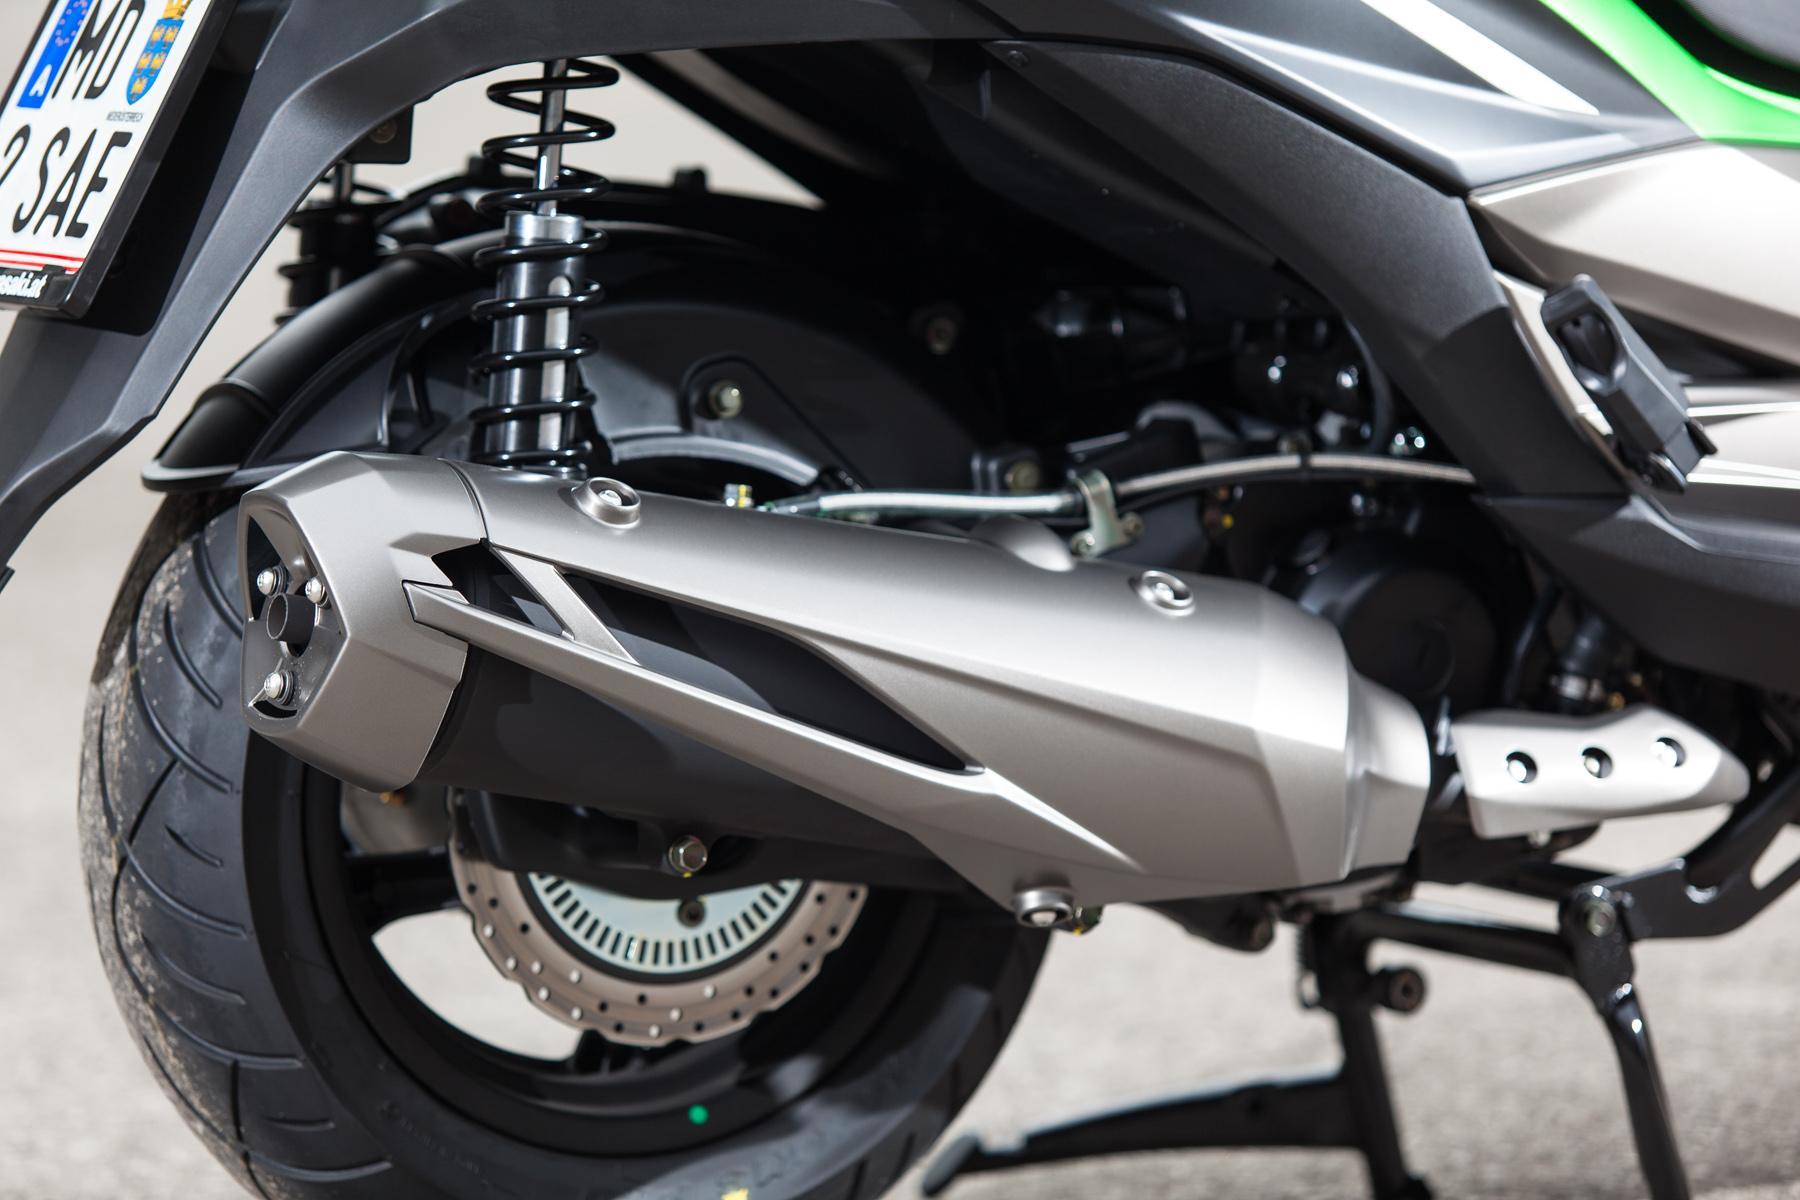 http://www.motorrad-bilder.at/slideshows/291/010647/kawasaki_j300_roller-14.jpg